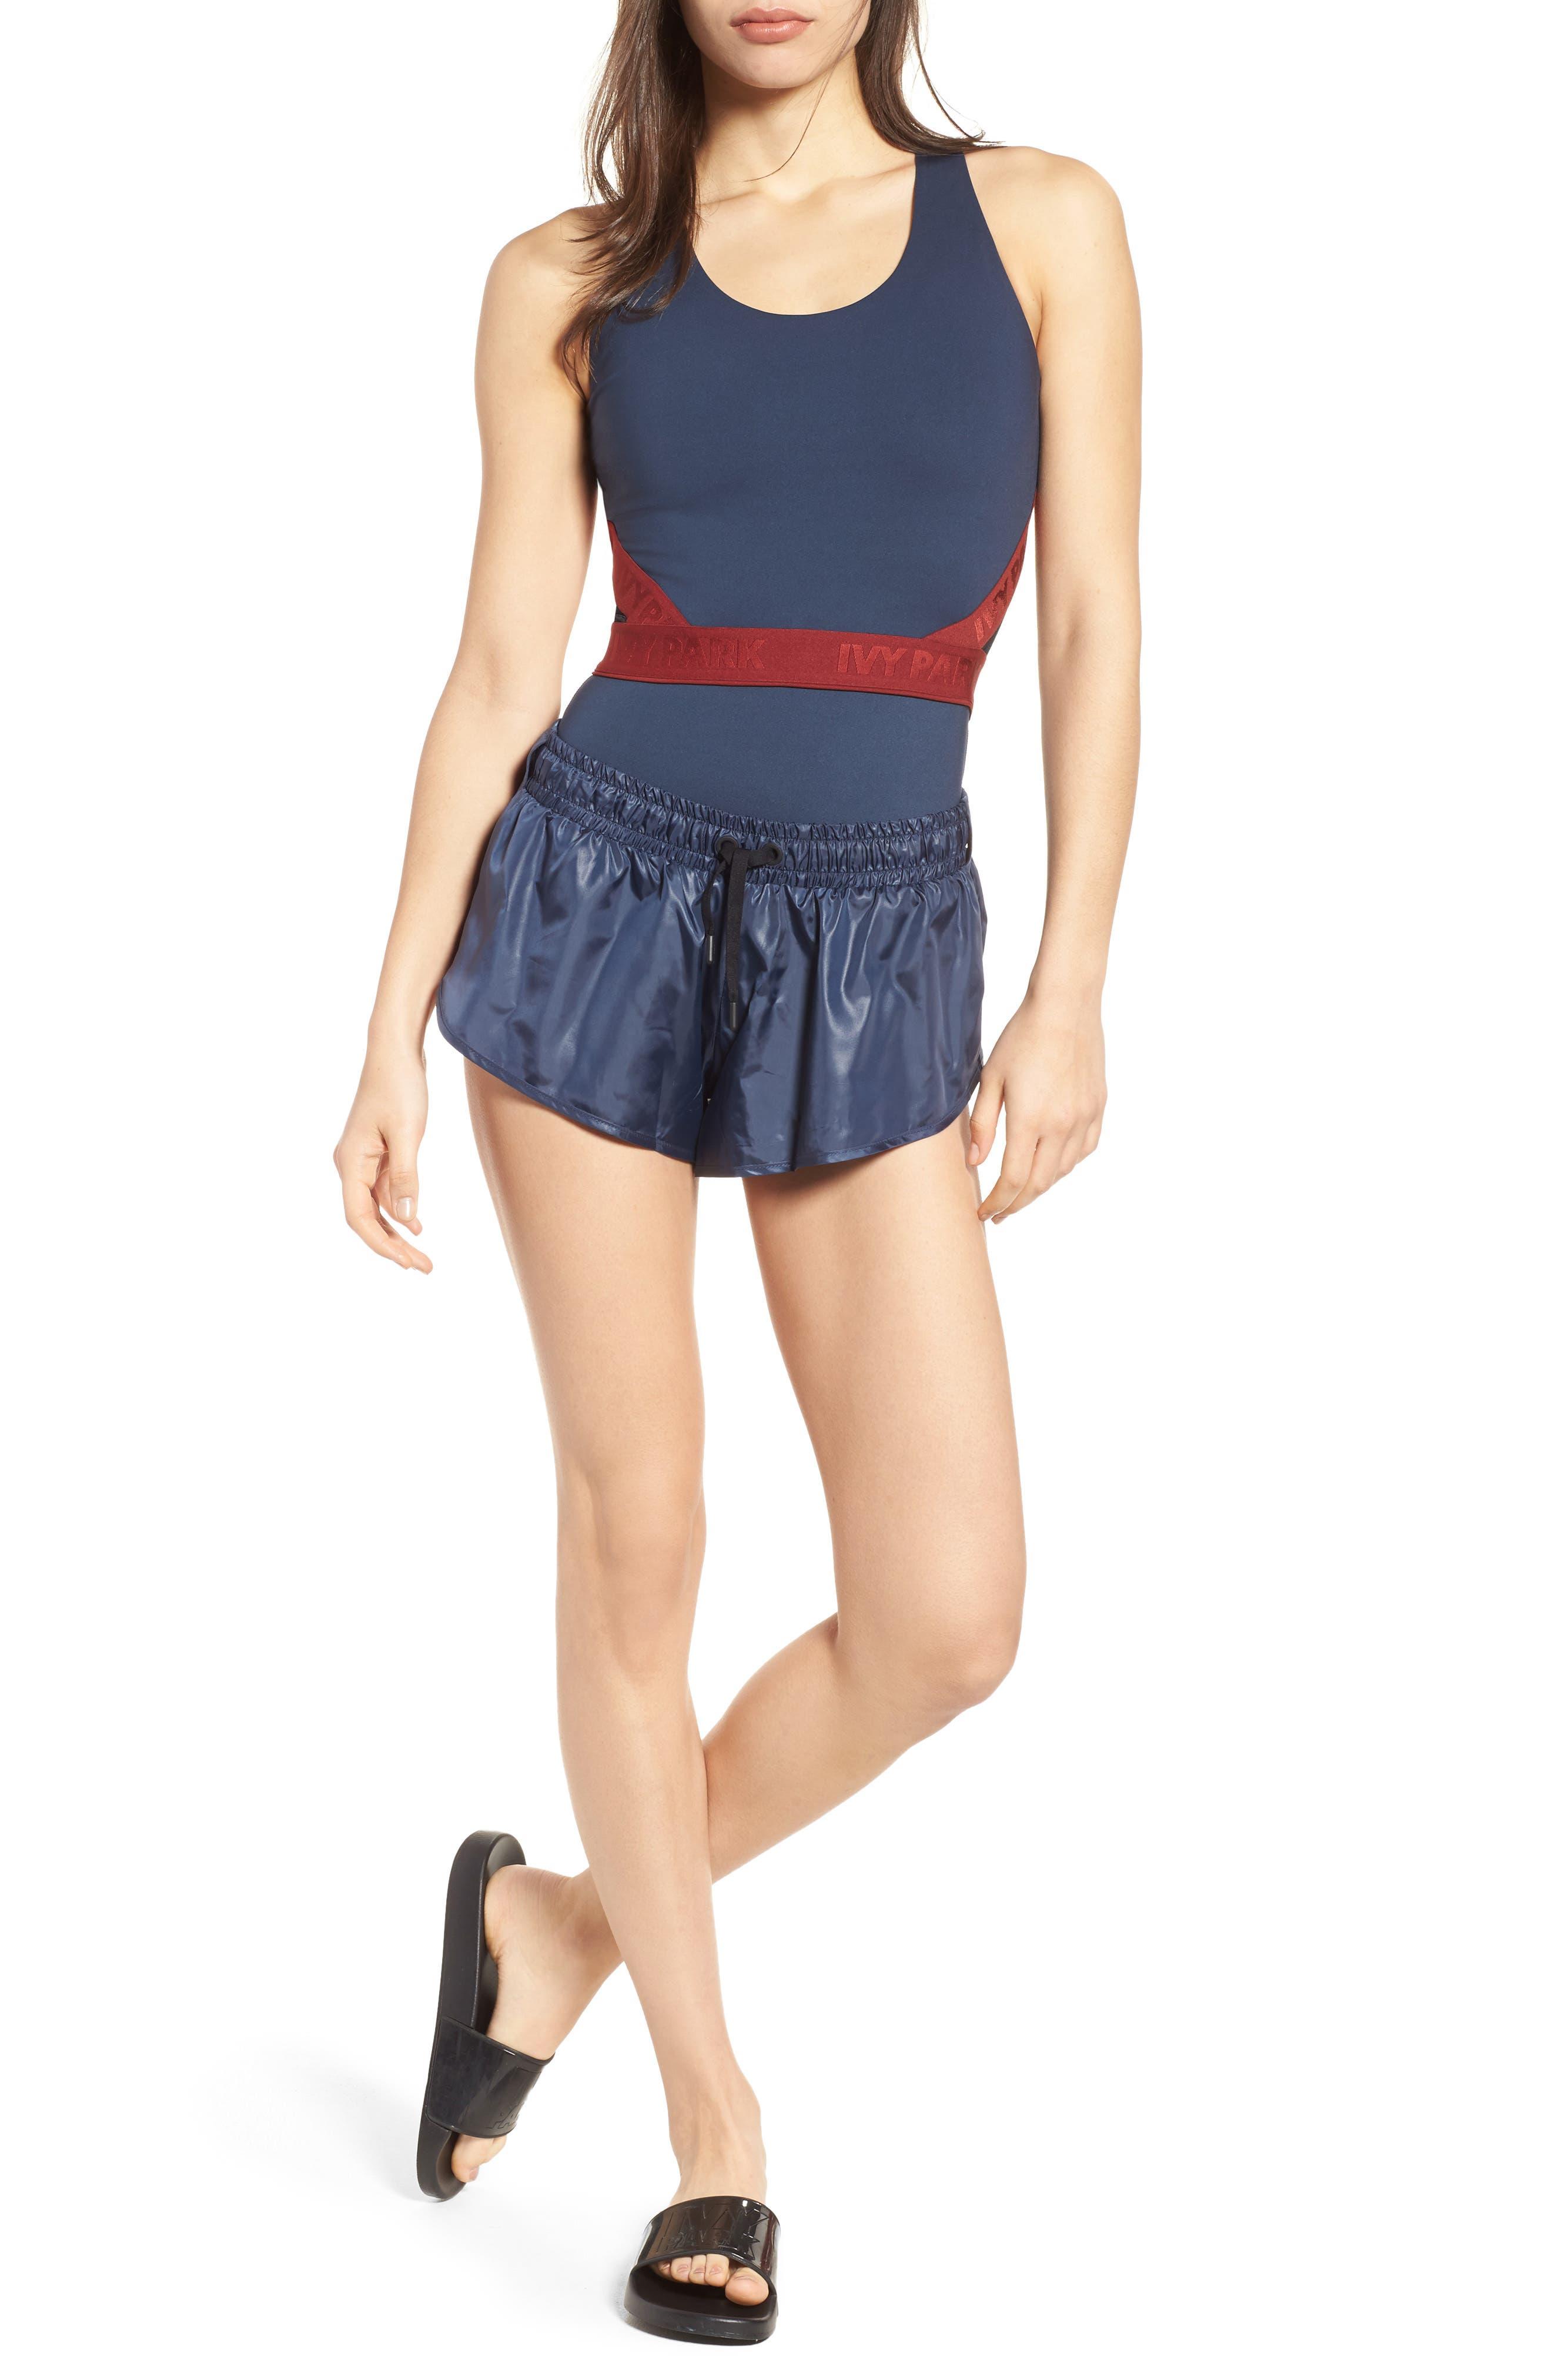 Alternate Image 1 Selected - IVY PARK® Colorblock Mesh Inset Bodysuit